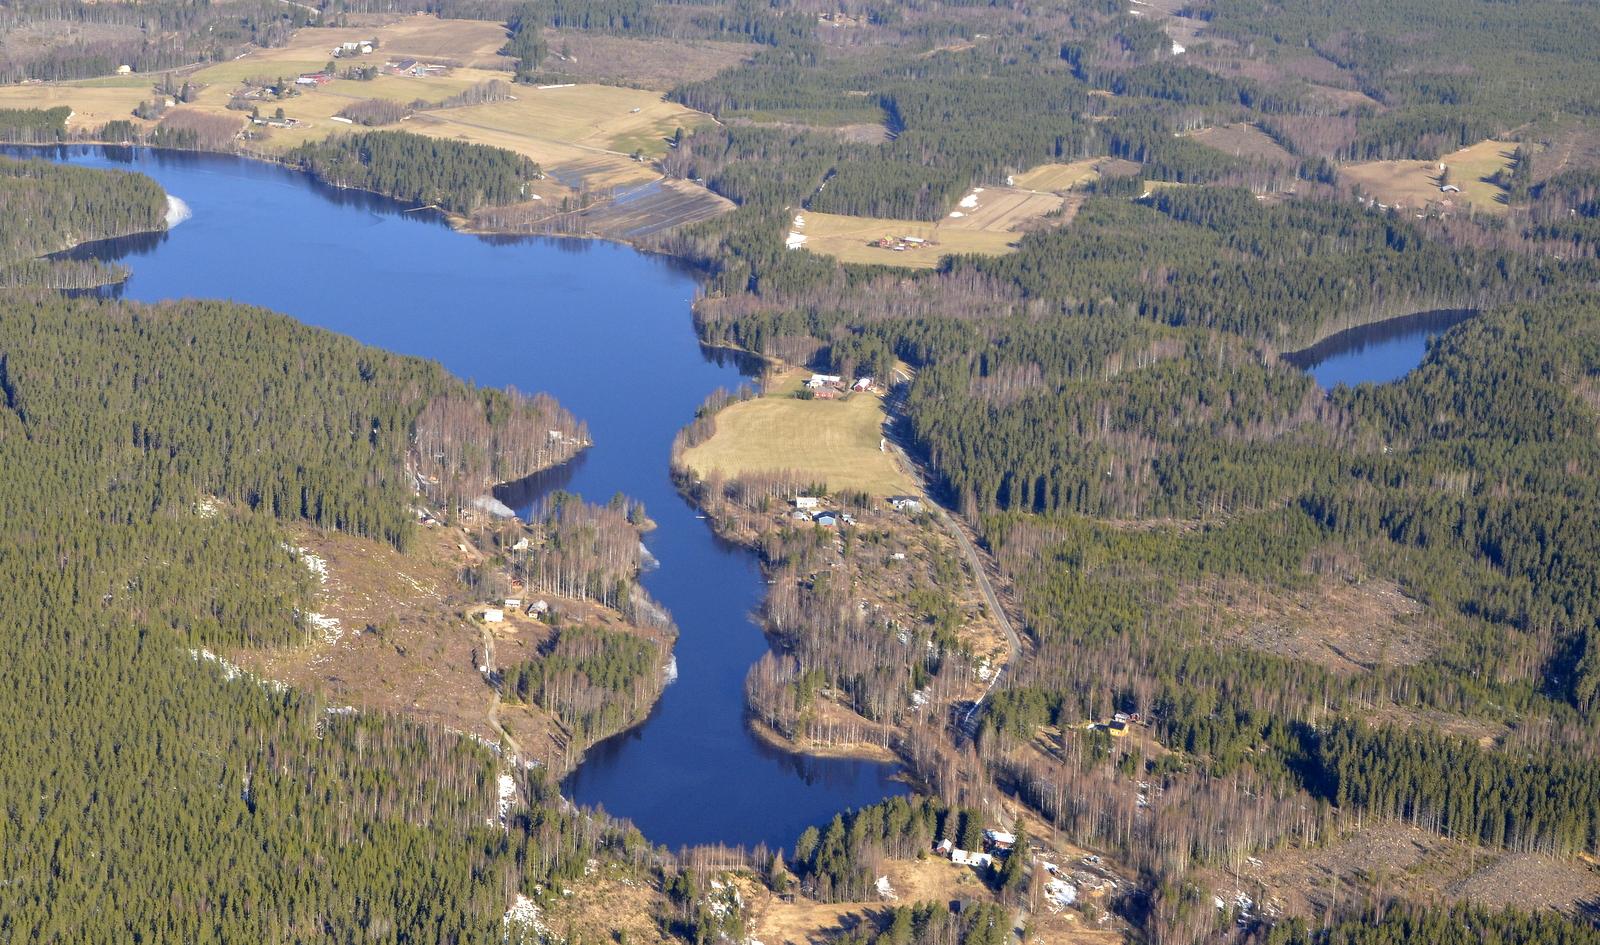 Kalaniemen Hakojärvi.